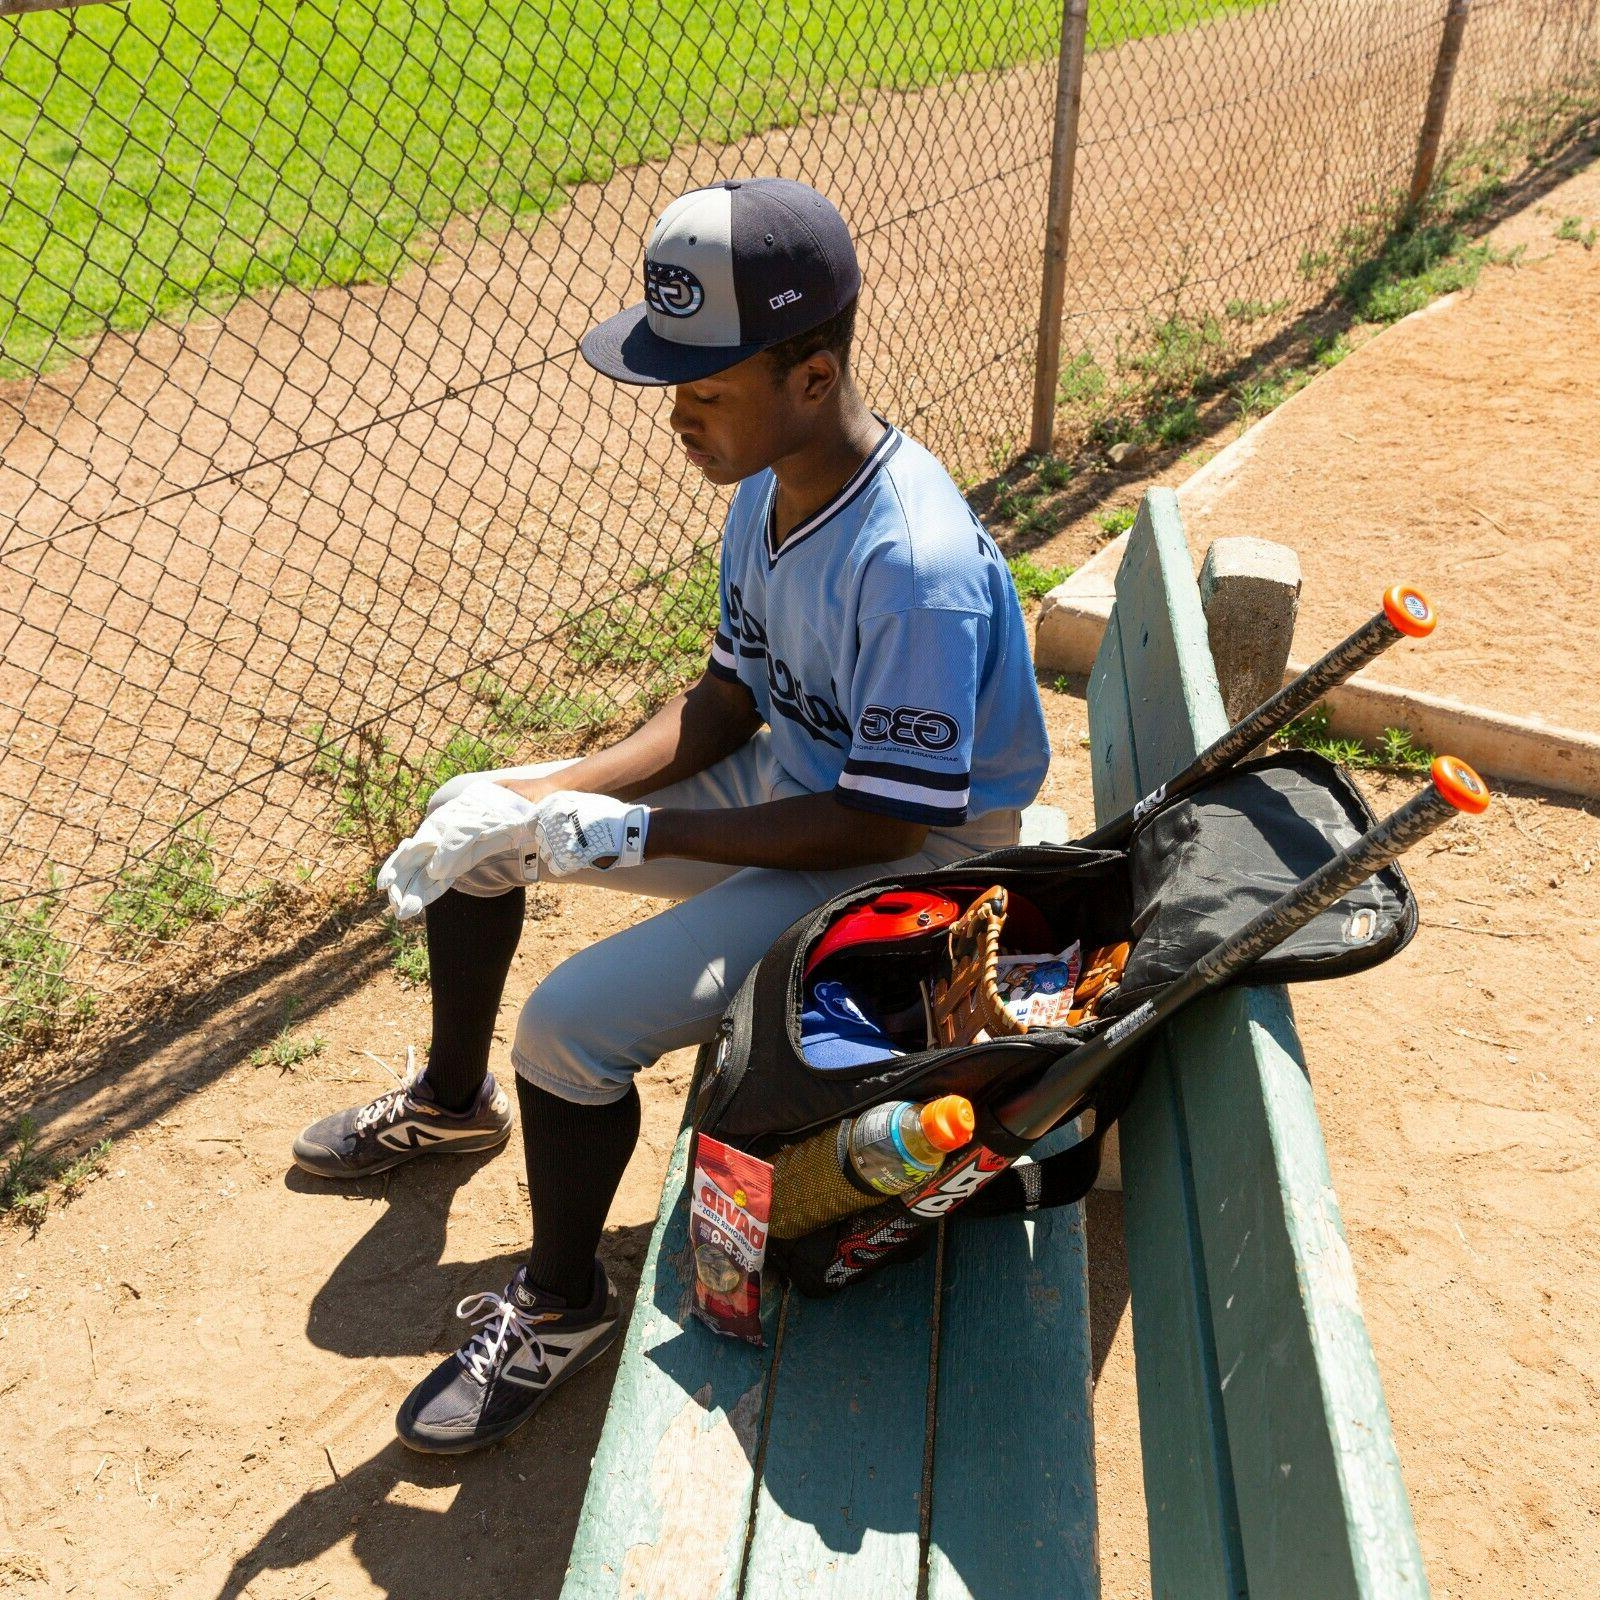 Baseball Backpack   Black Bag USB Charger Youth